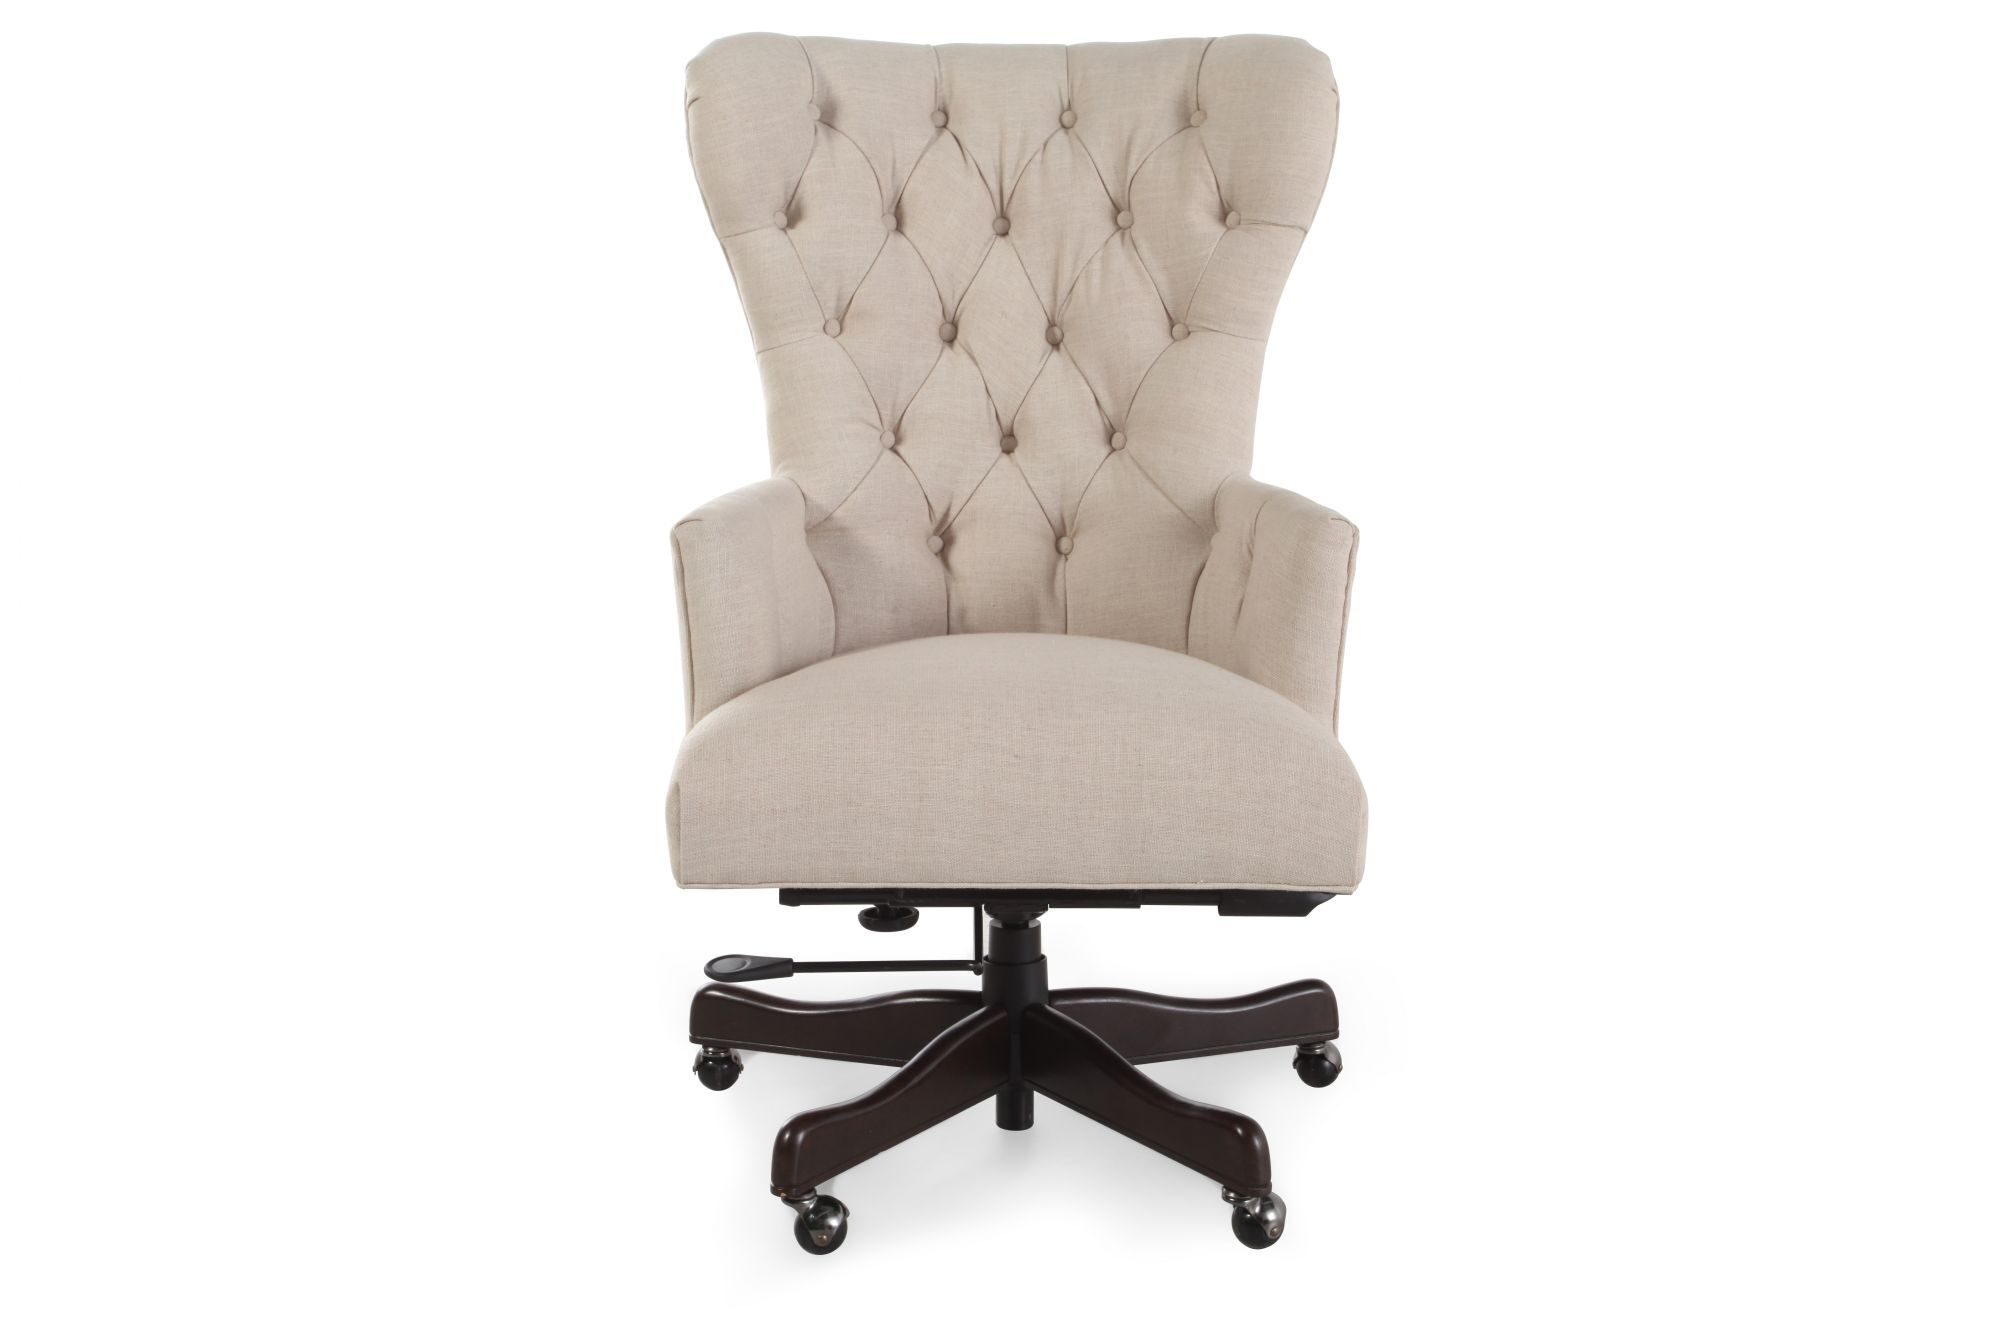 Images Button Tufted Swivel Desk Chairu0026nbsp;in Natchez Brown Button Tufted  Swivel Desk Chairu0026nbsp;in Natchez Brown